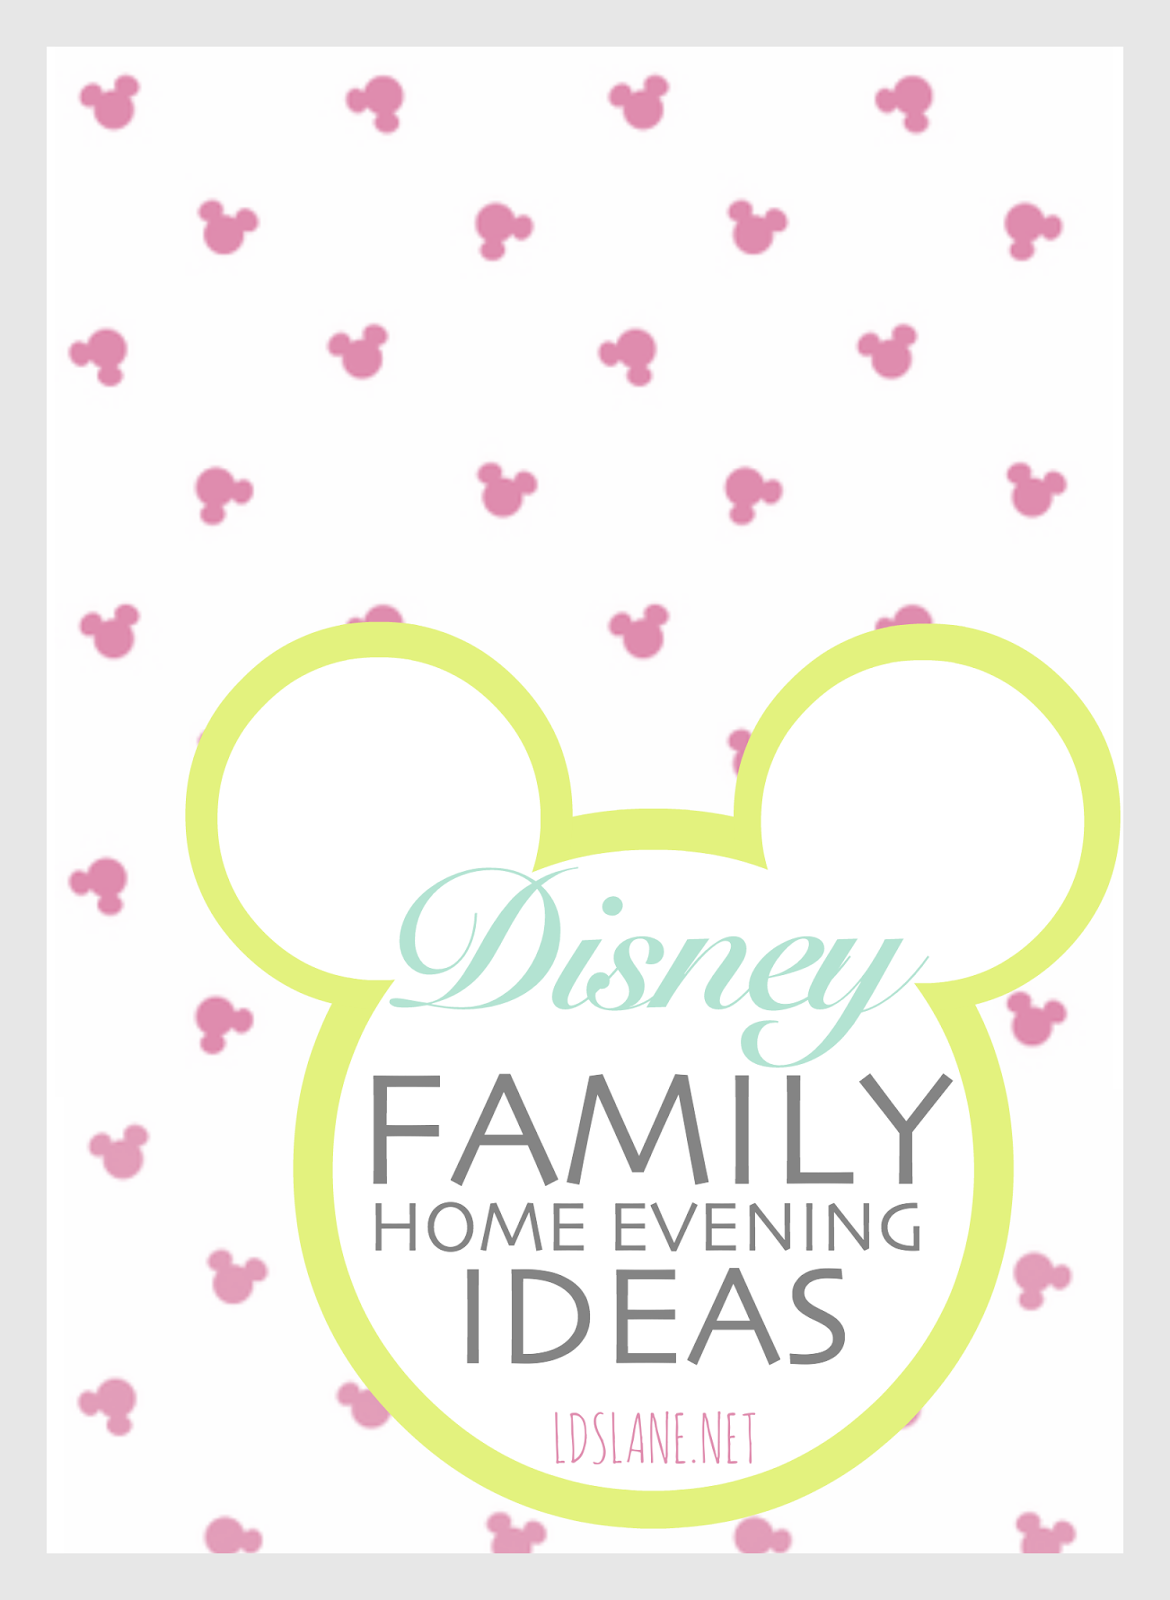 Family Home Evening: Disney Movies (LDS Lane) | Pinterest | Disney ...